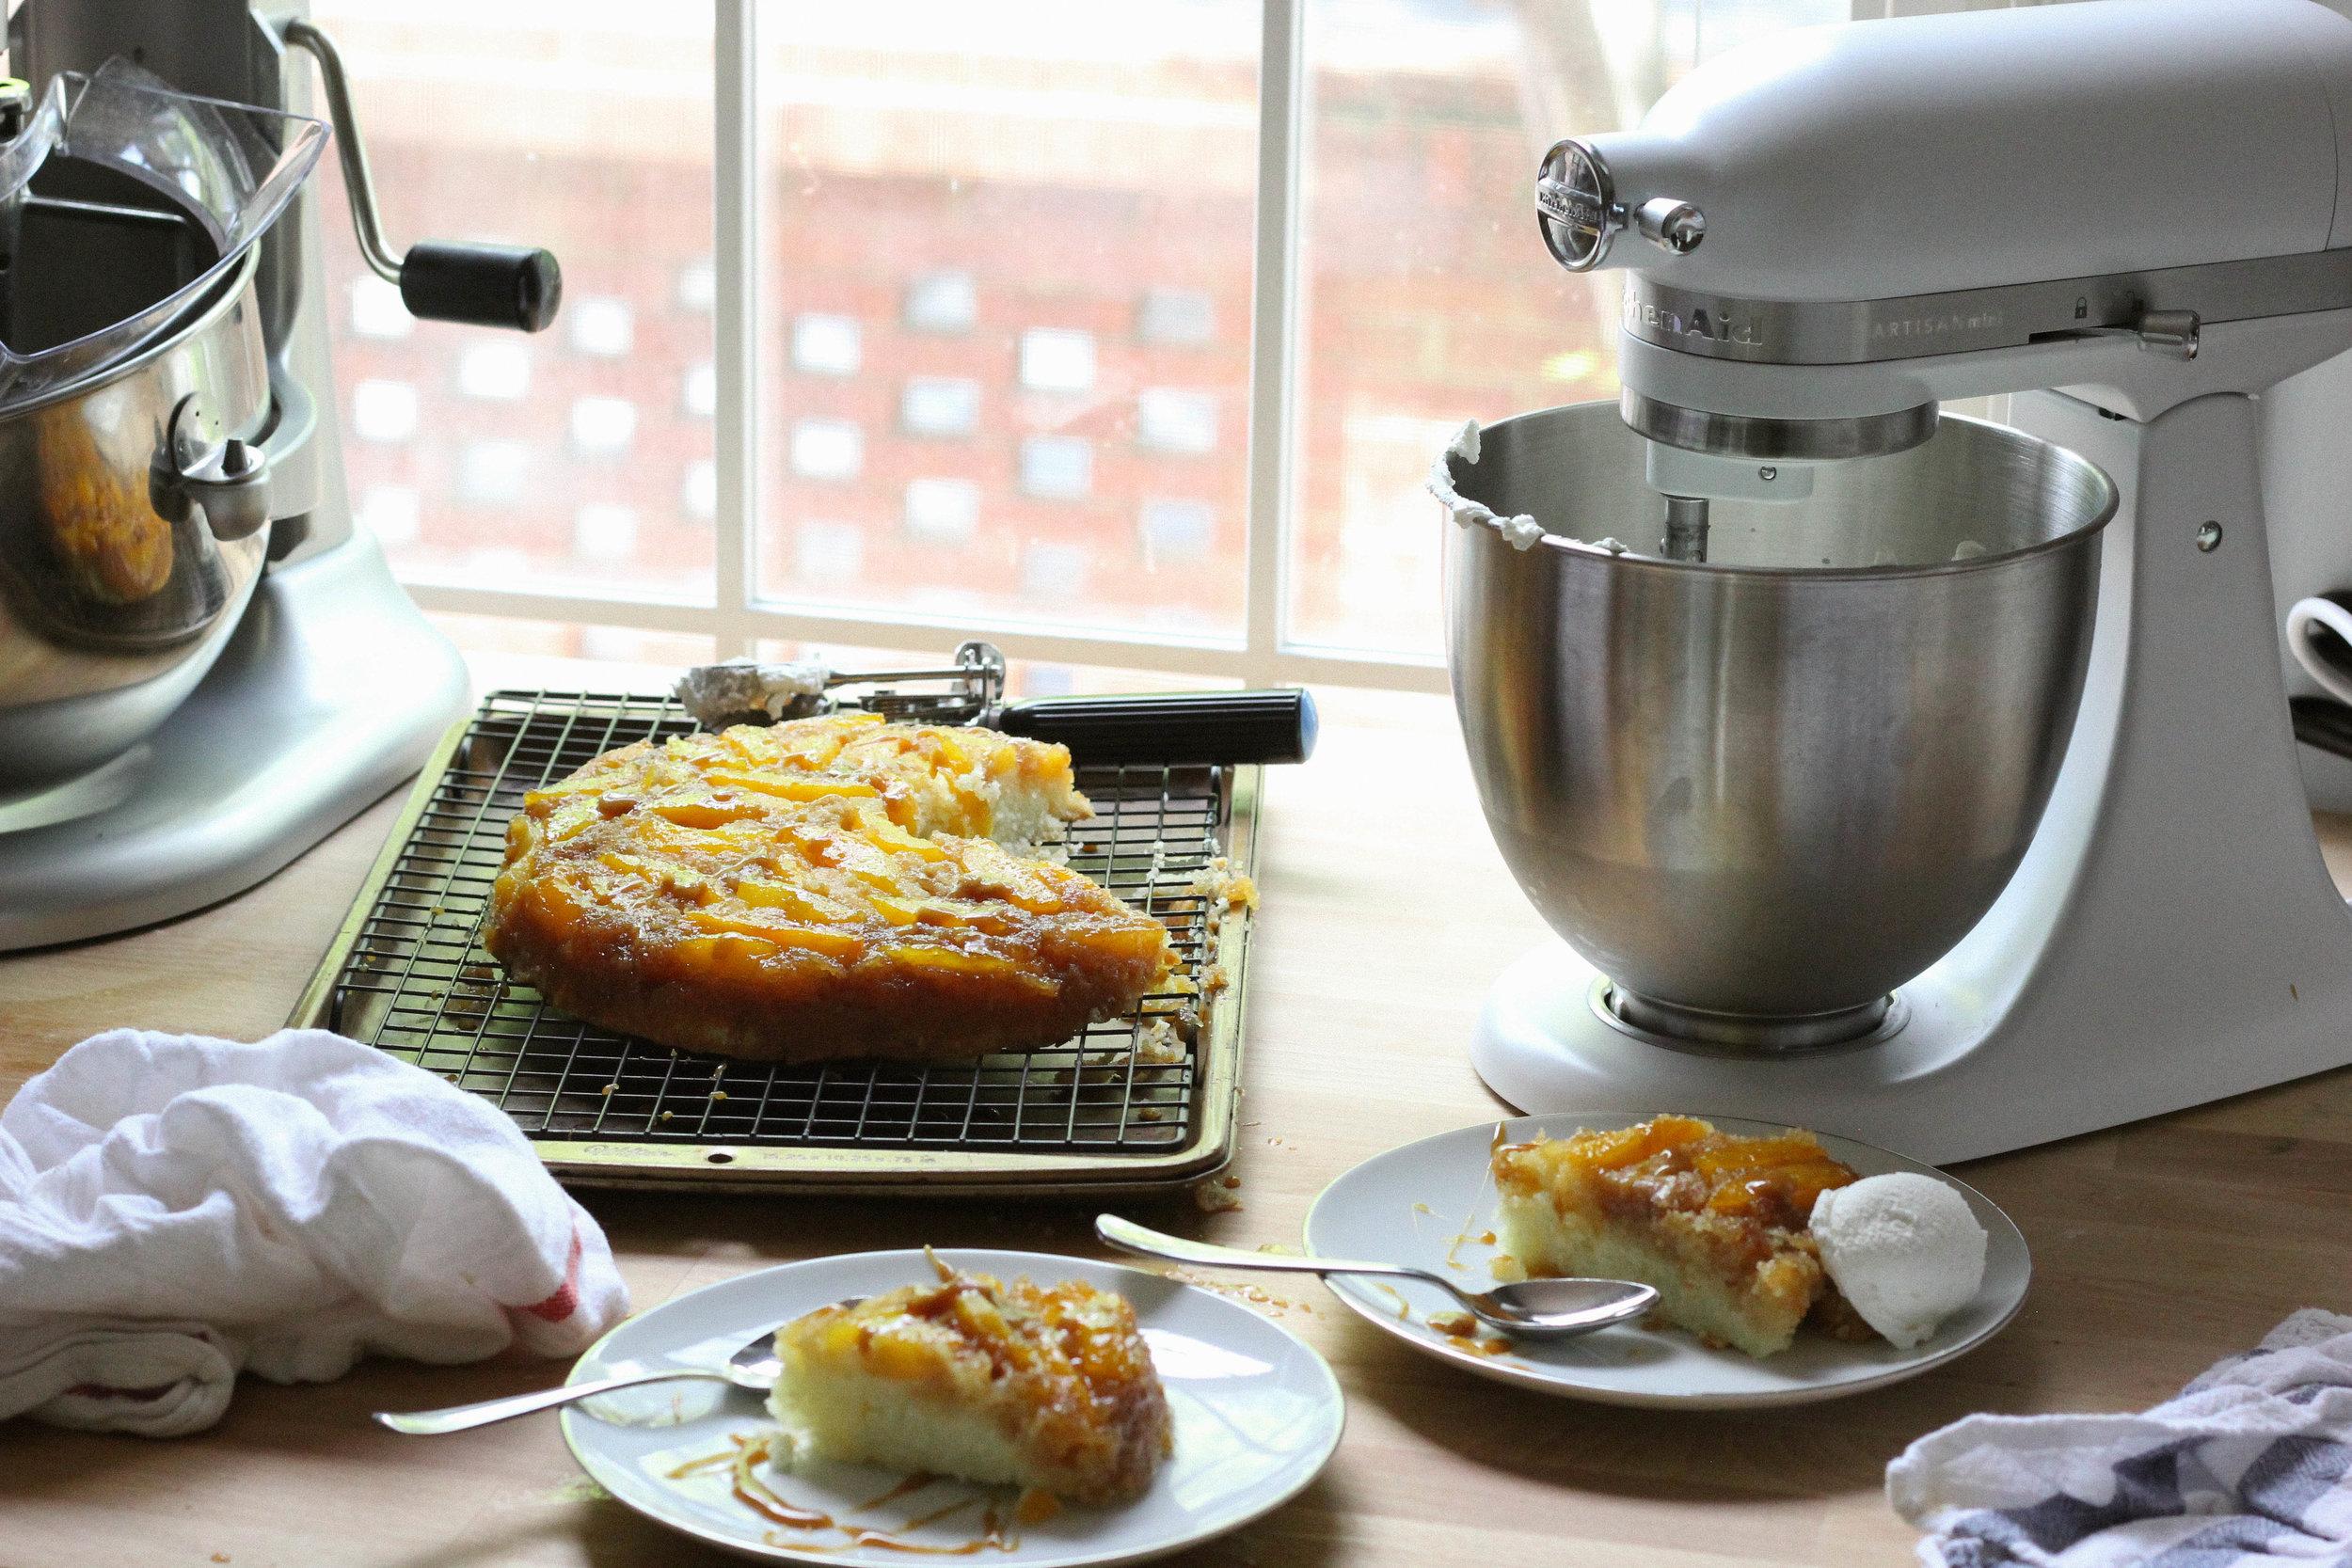 KitchenAid®-Artisan®-Mini-Summer-Peach-Upside-Down-Cake-7-1-of-1.jpg